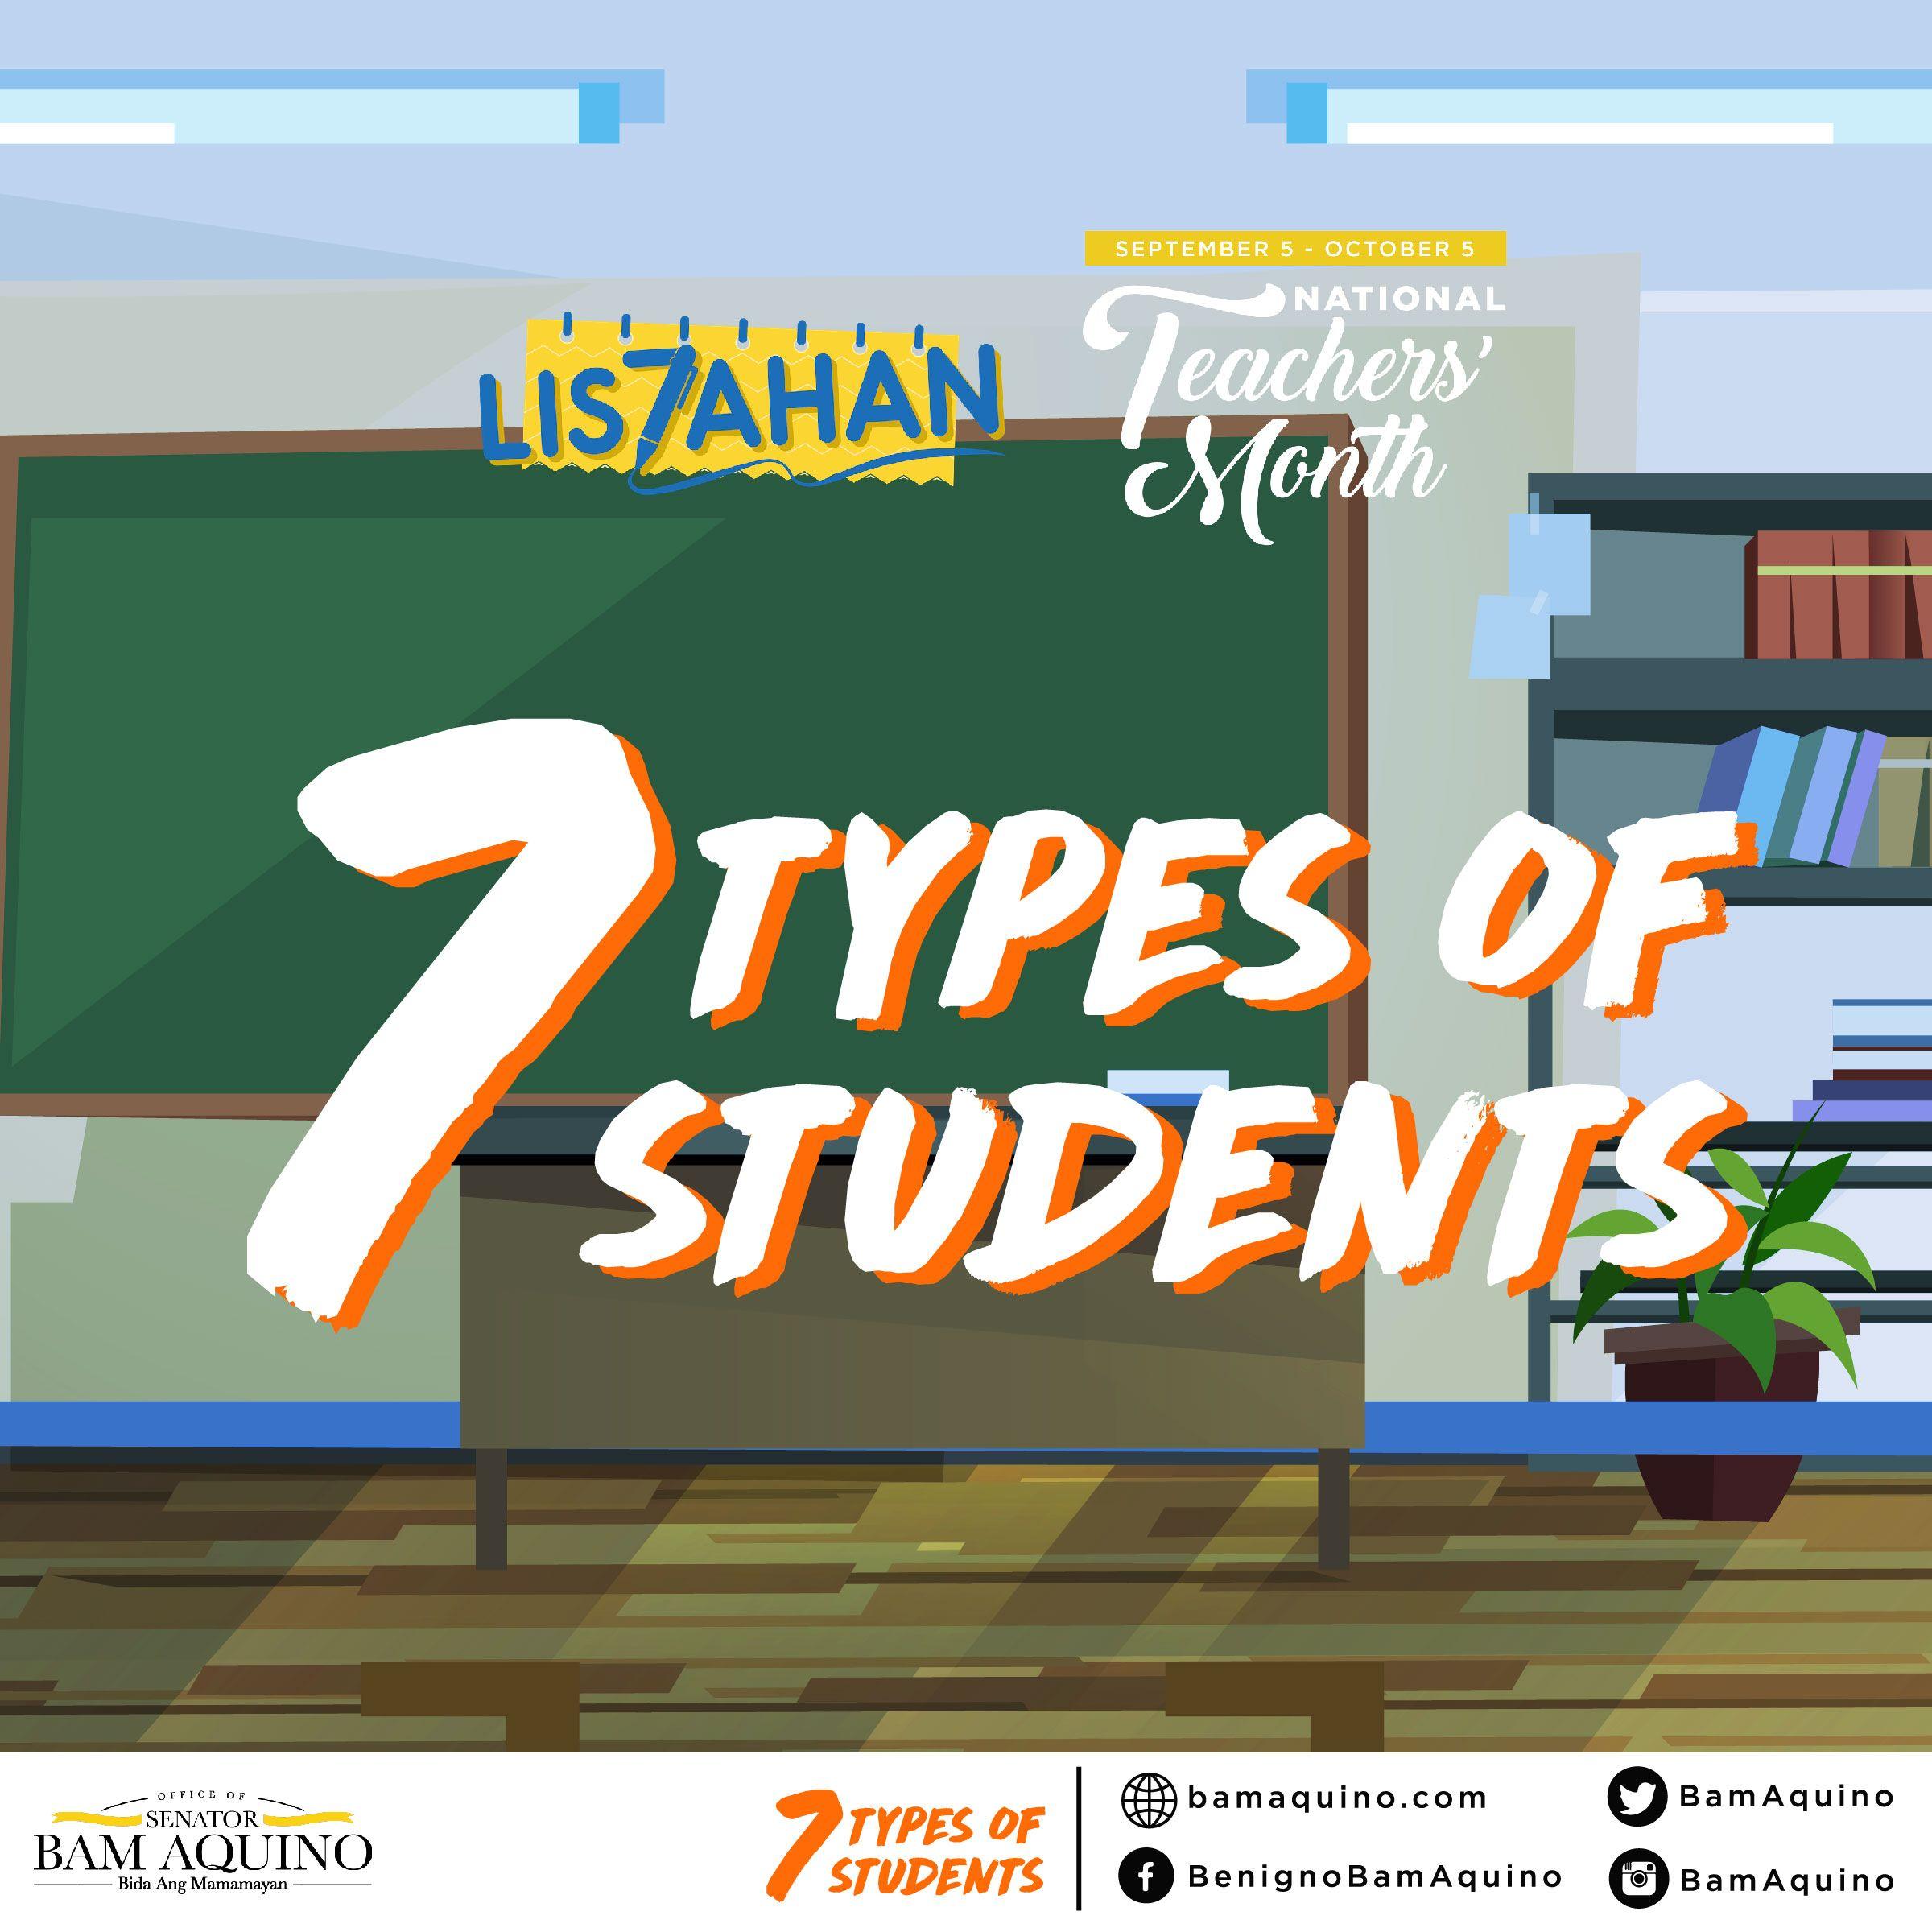 Student By Senator Bam Aquino On 7 Types Of Students